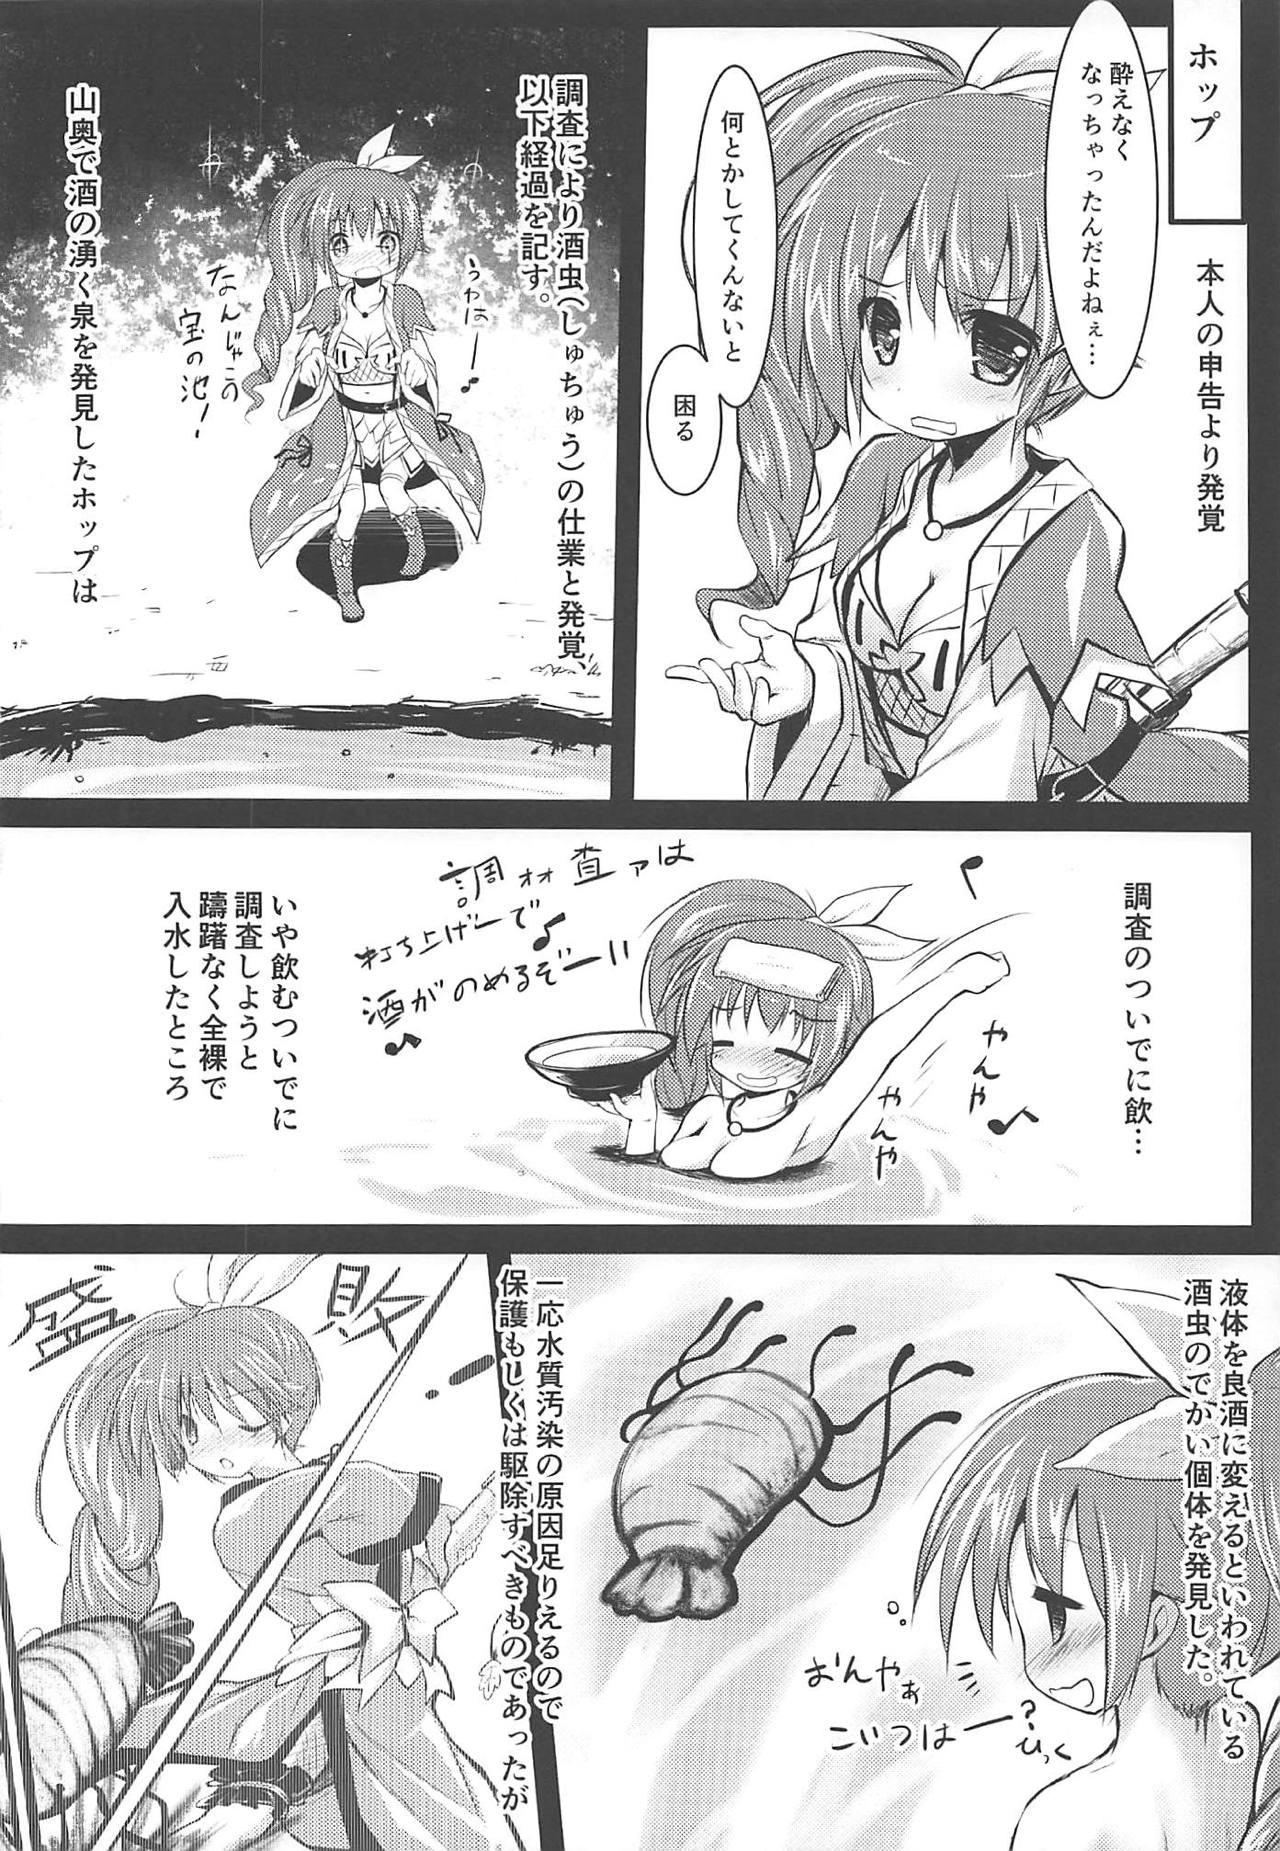 Gaichuu Higai Houkokusho File 3 20